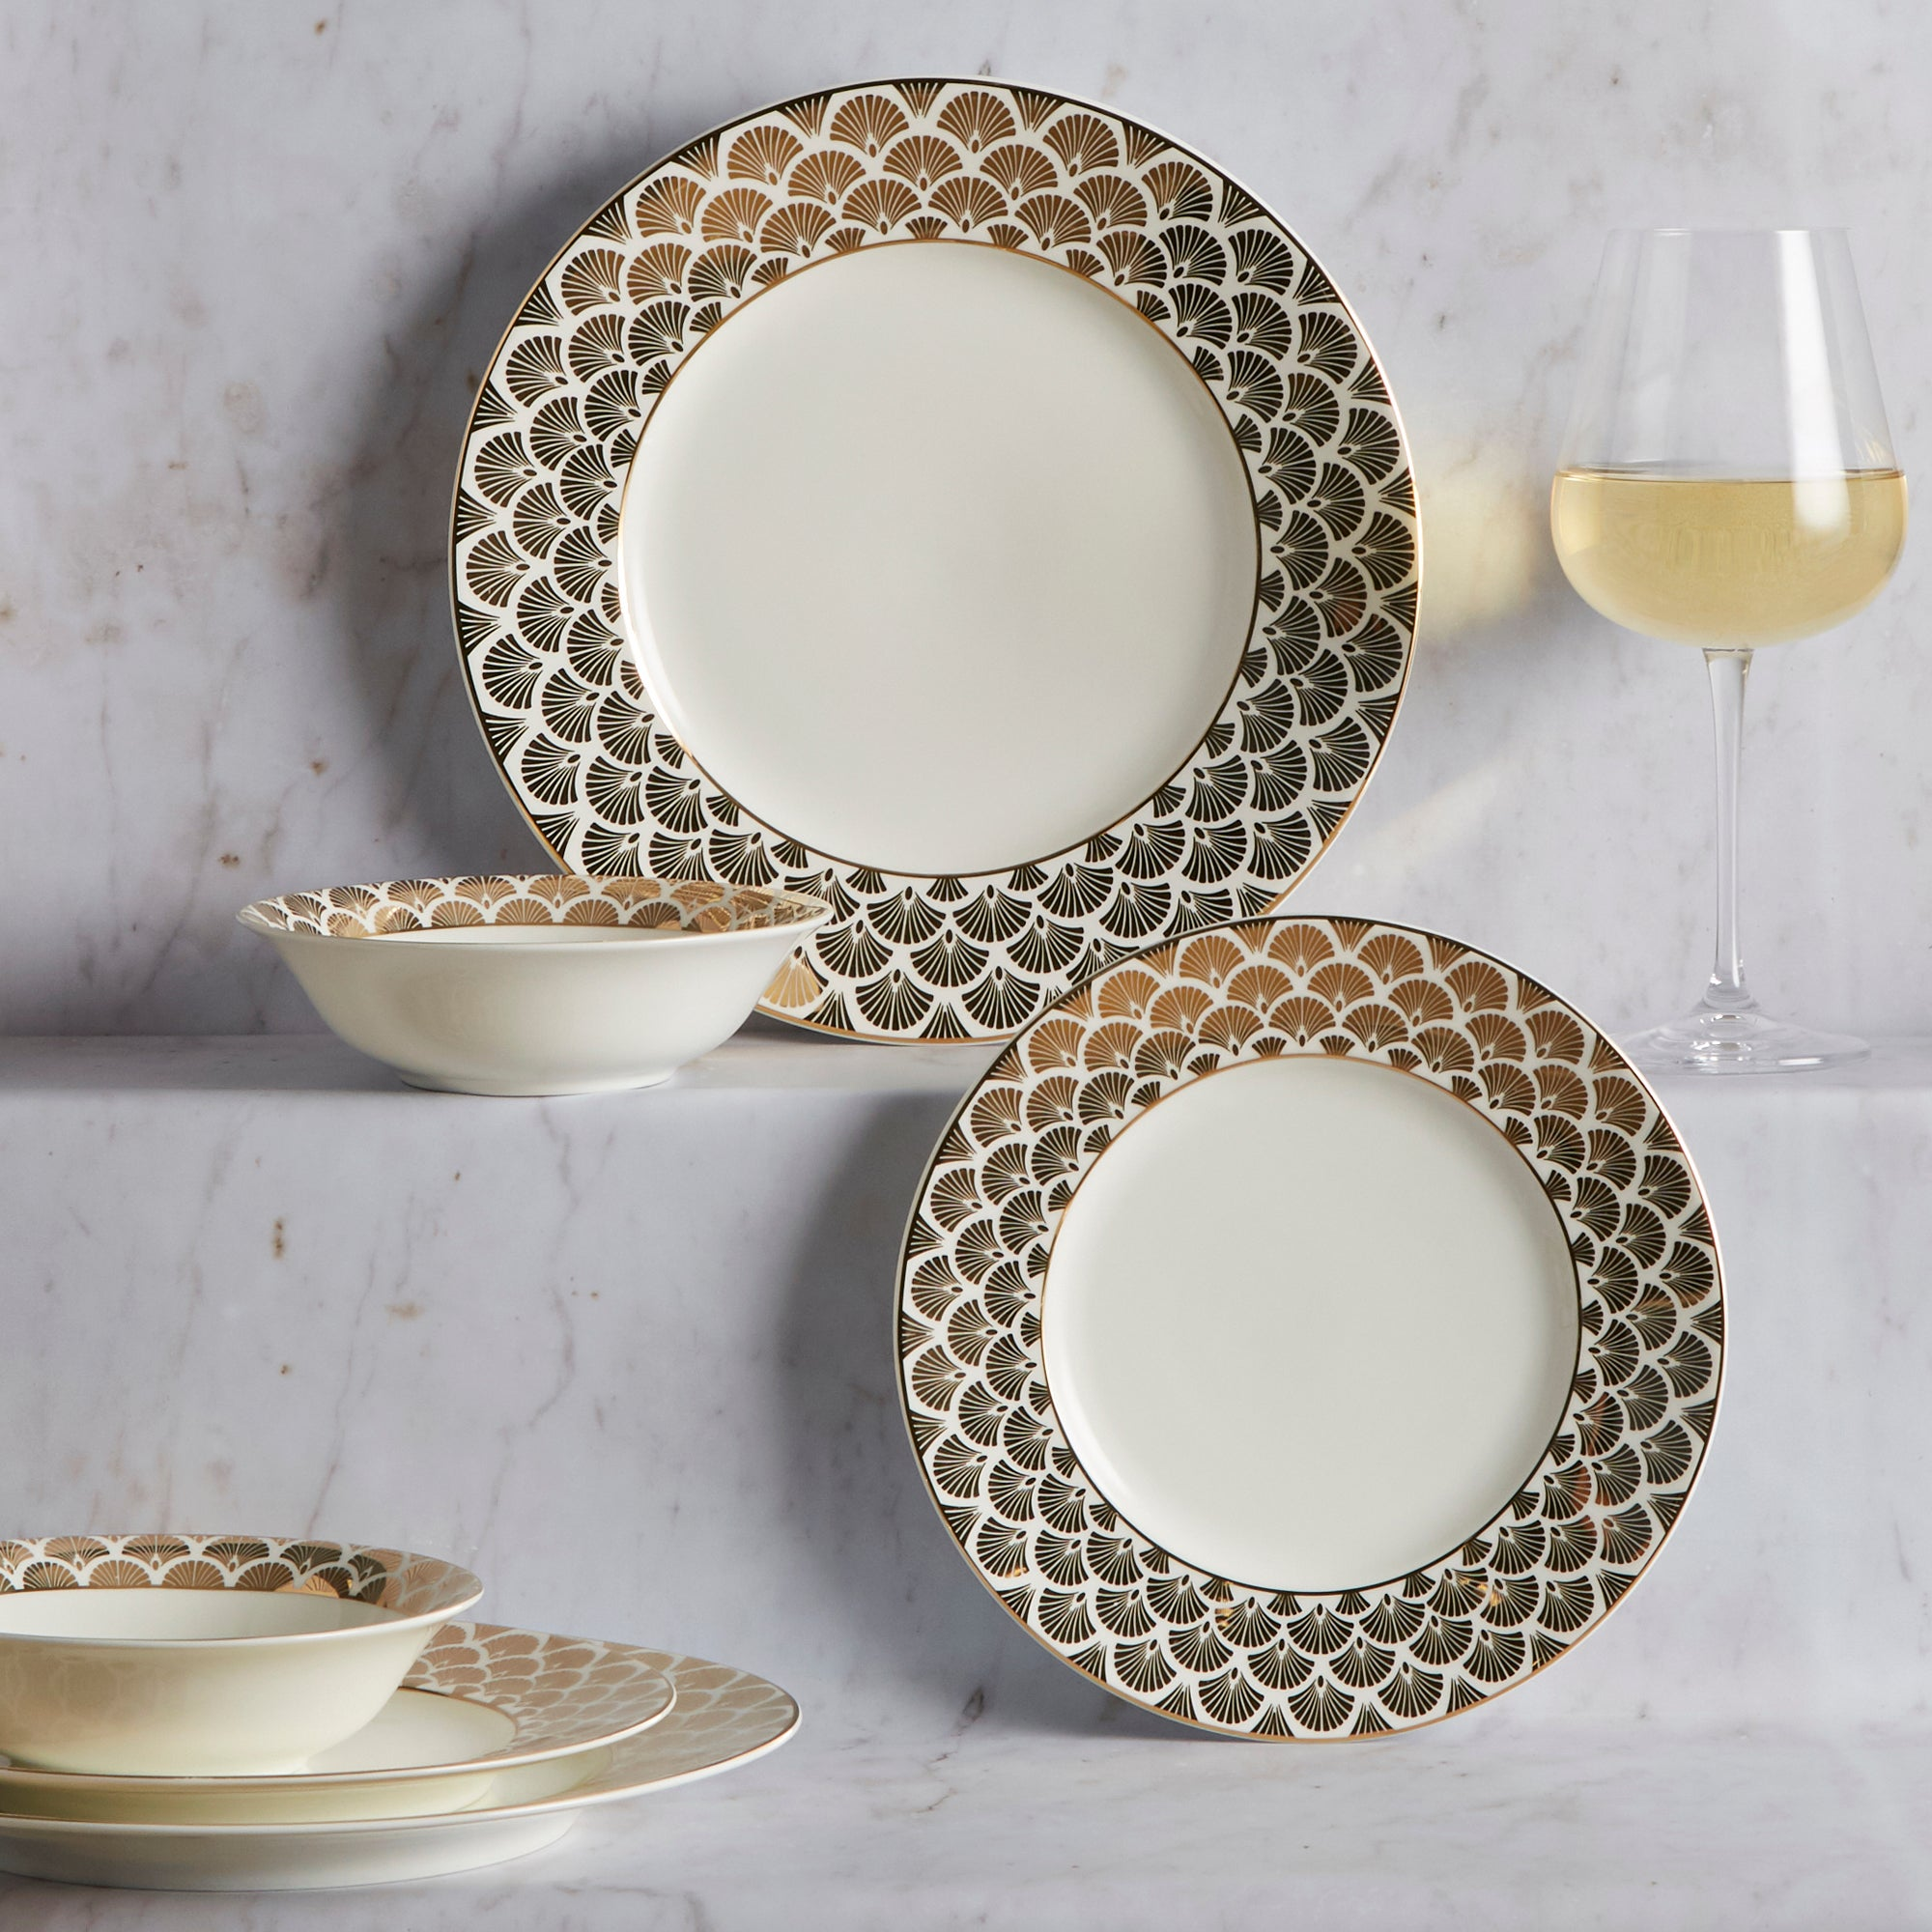 Image of 5A Fifth Avenue Bergen Gold 12 Piece Dinner Set Plum